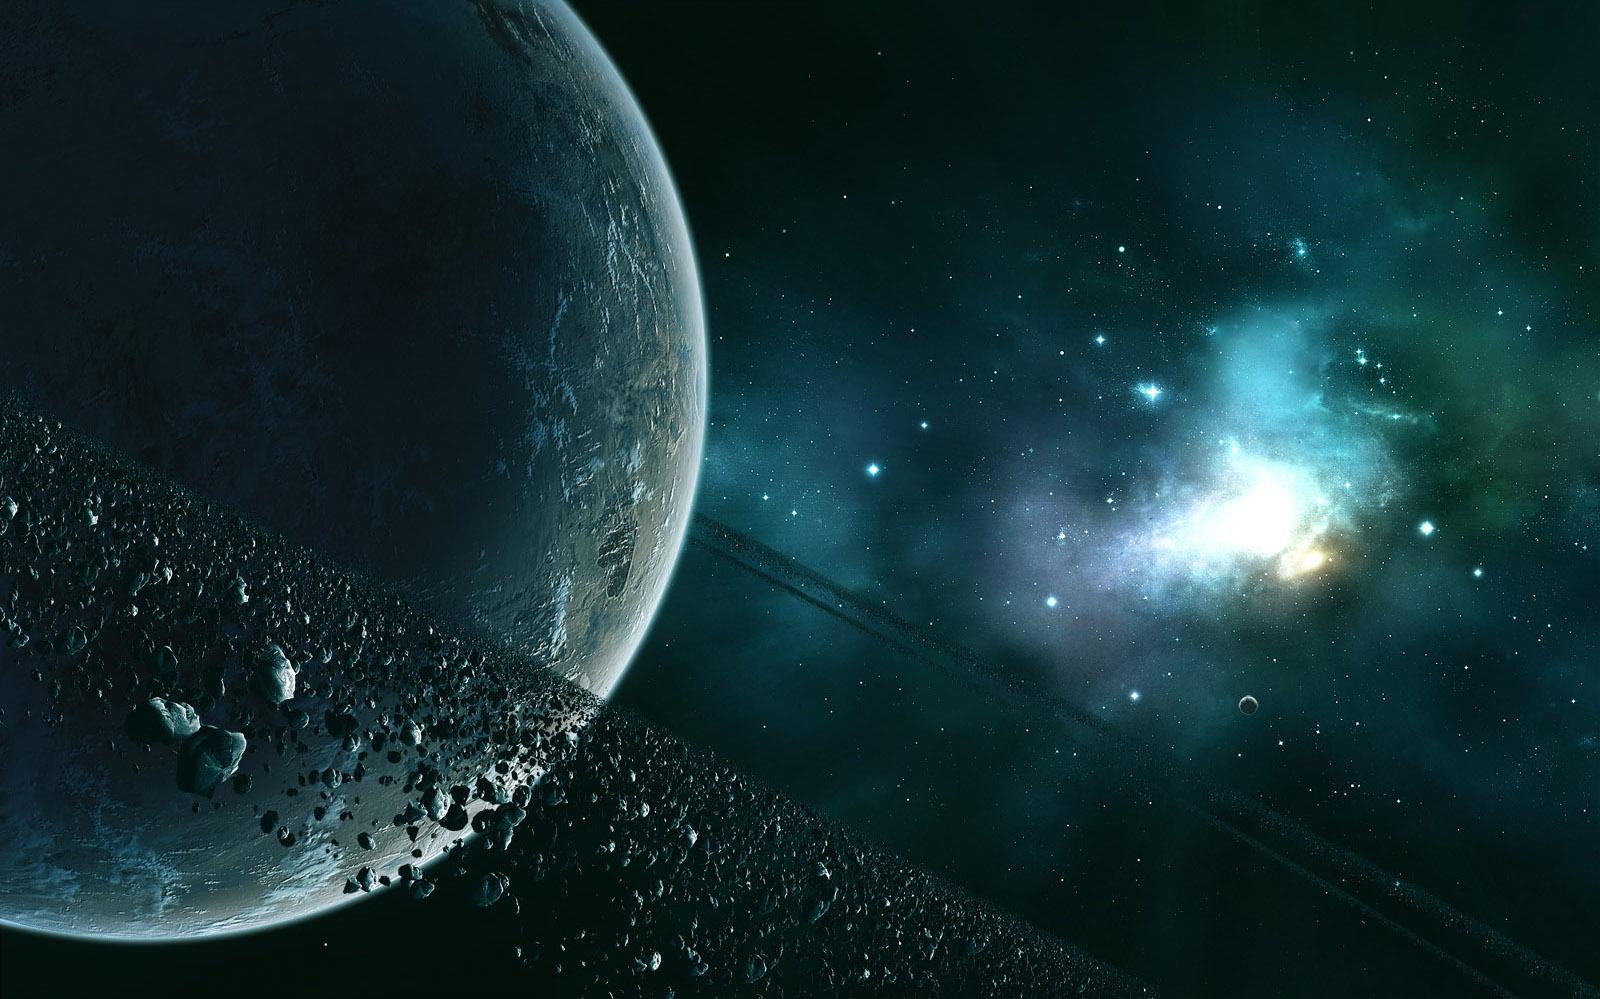 galaxy-wallpaper-background-HD_14